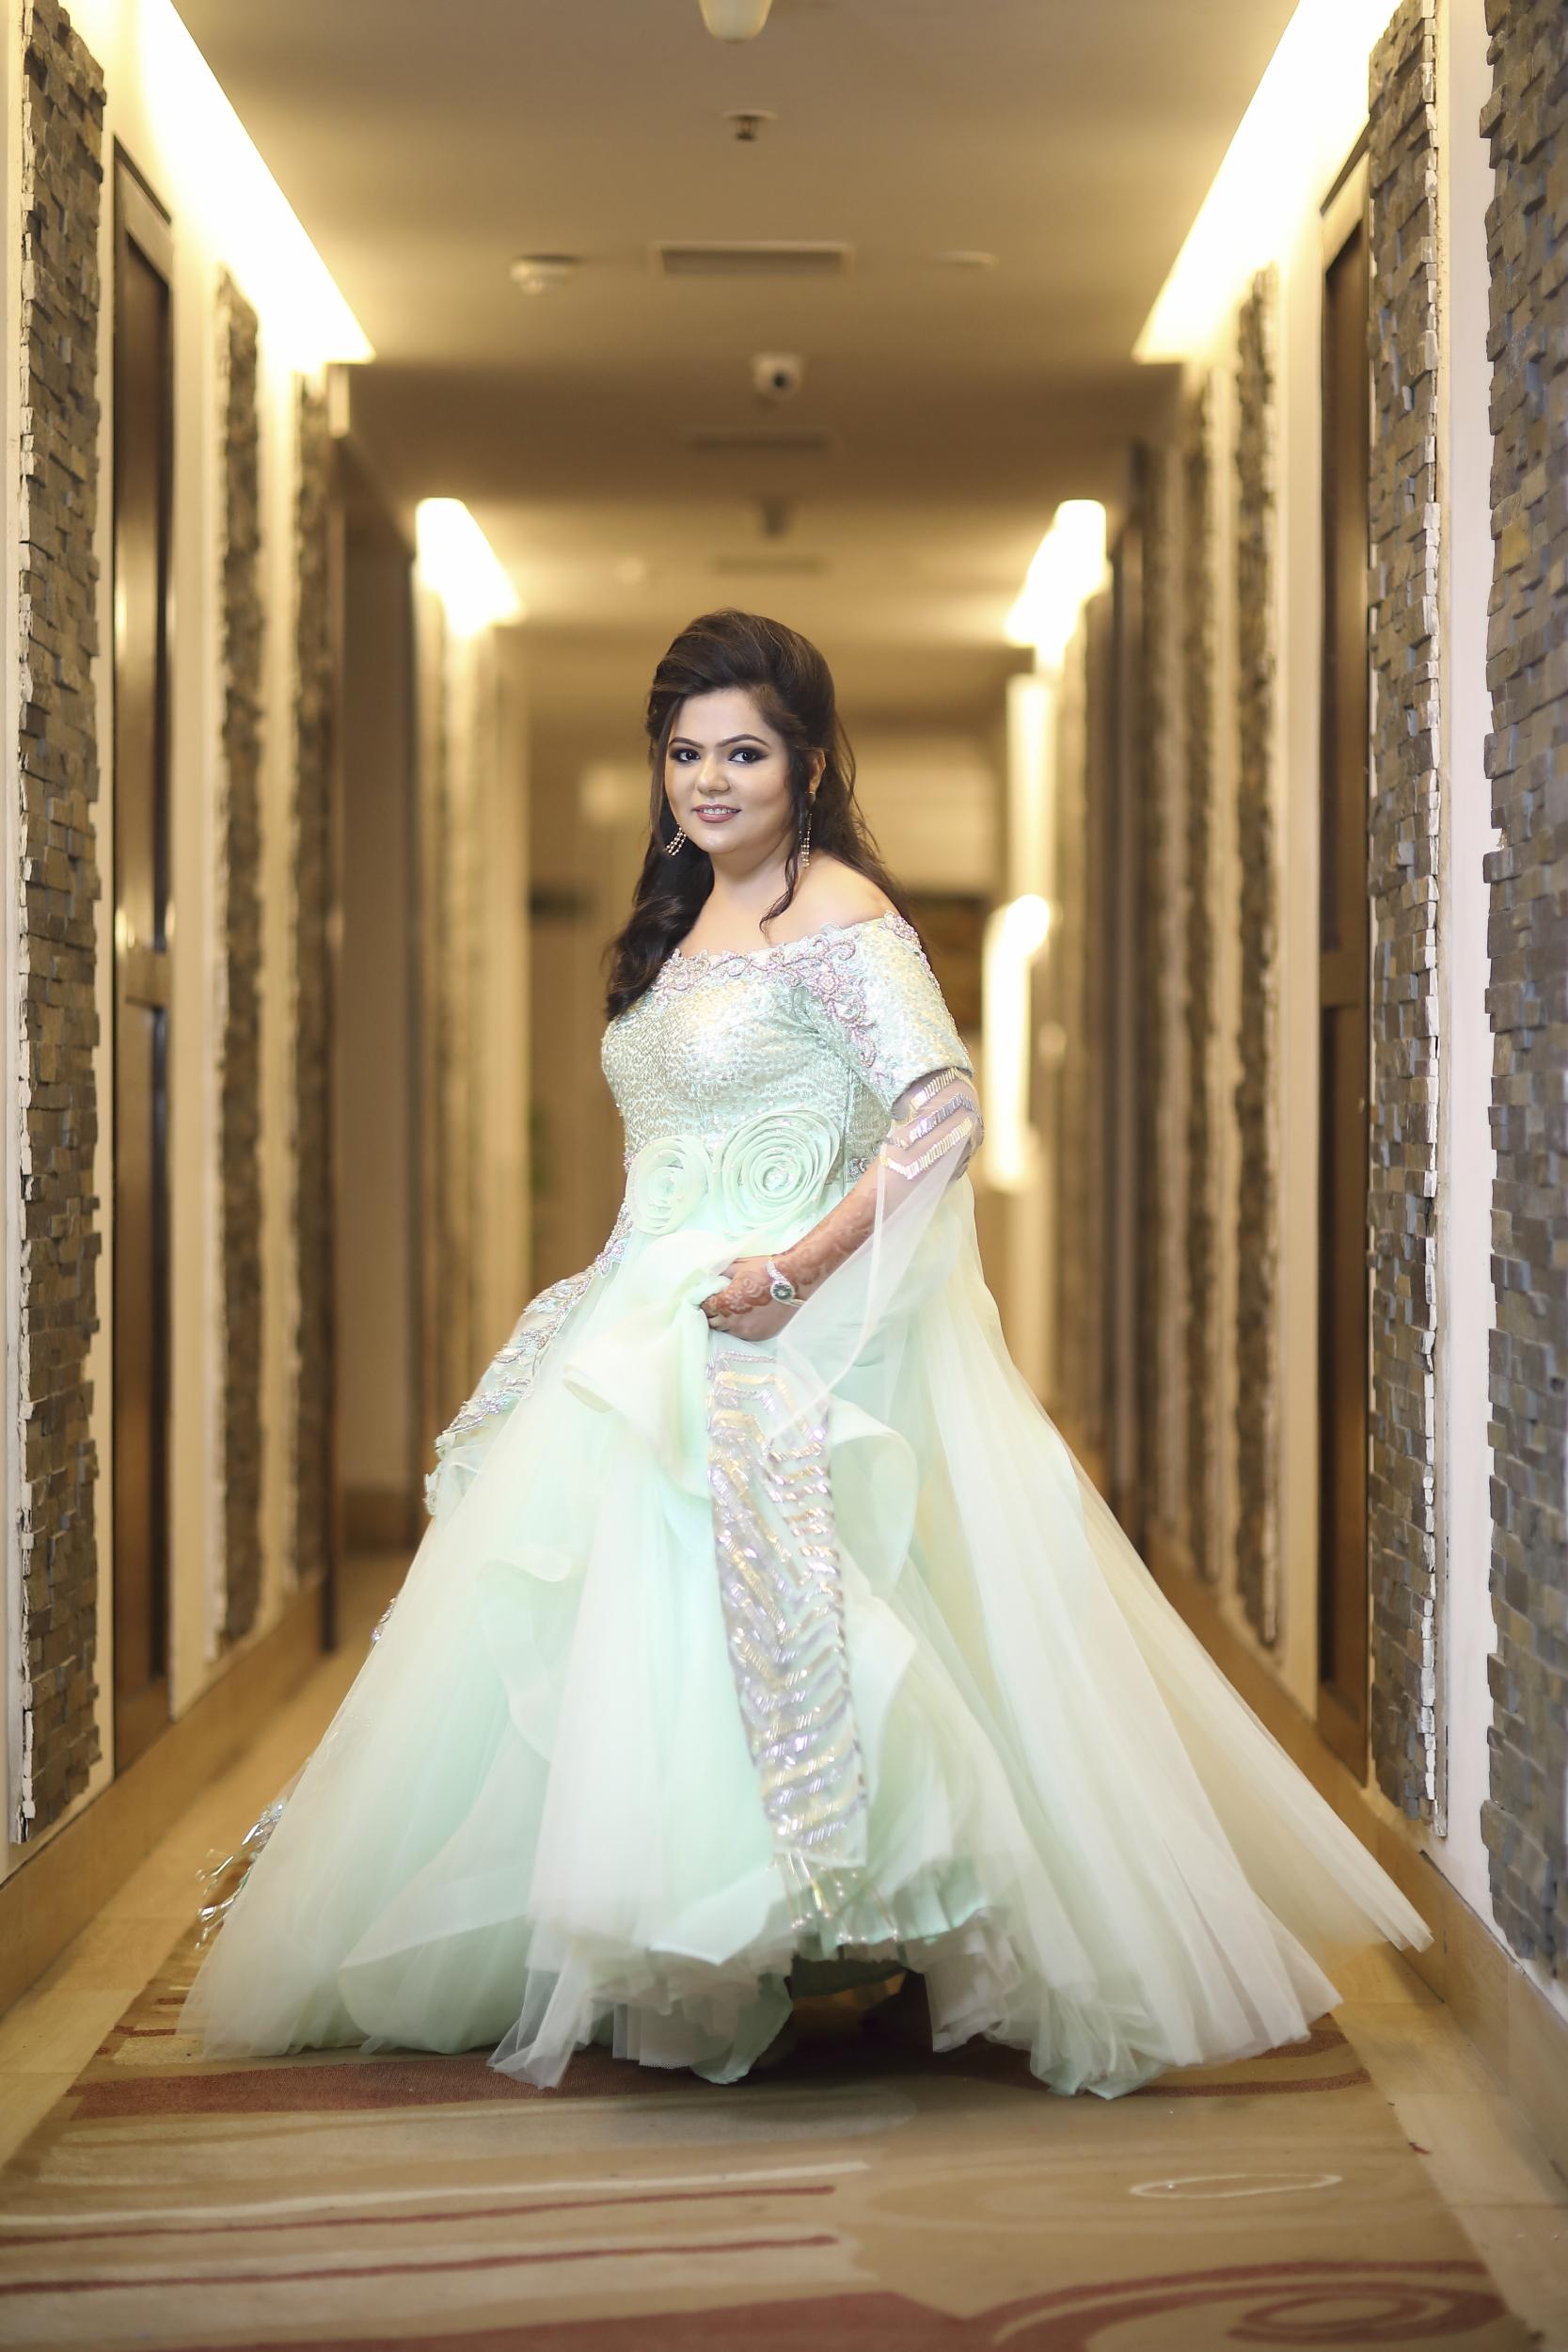 TWR Best candid wedding 90 photographers Delhi